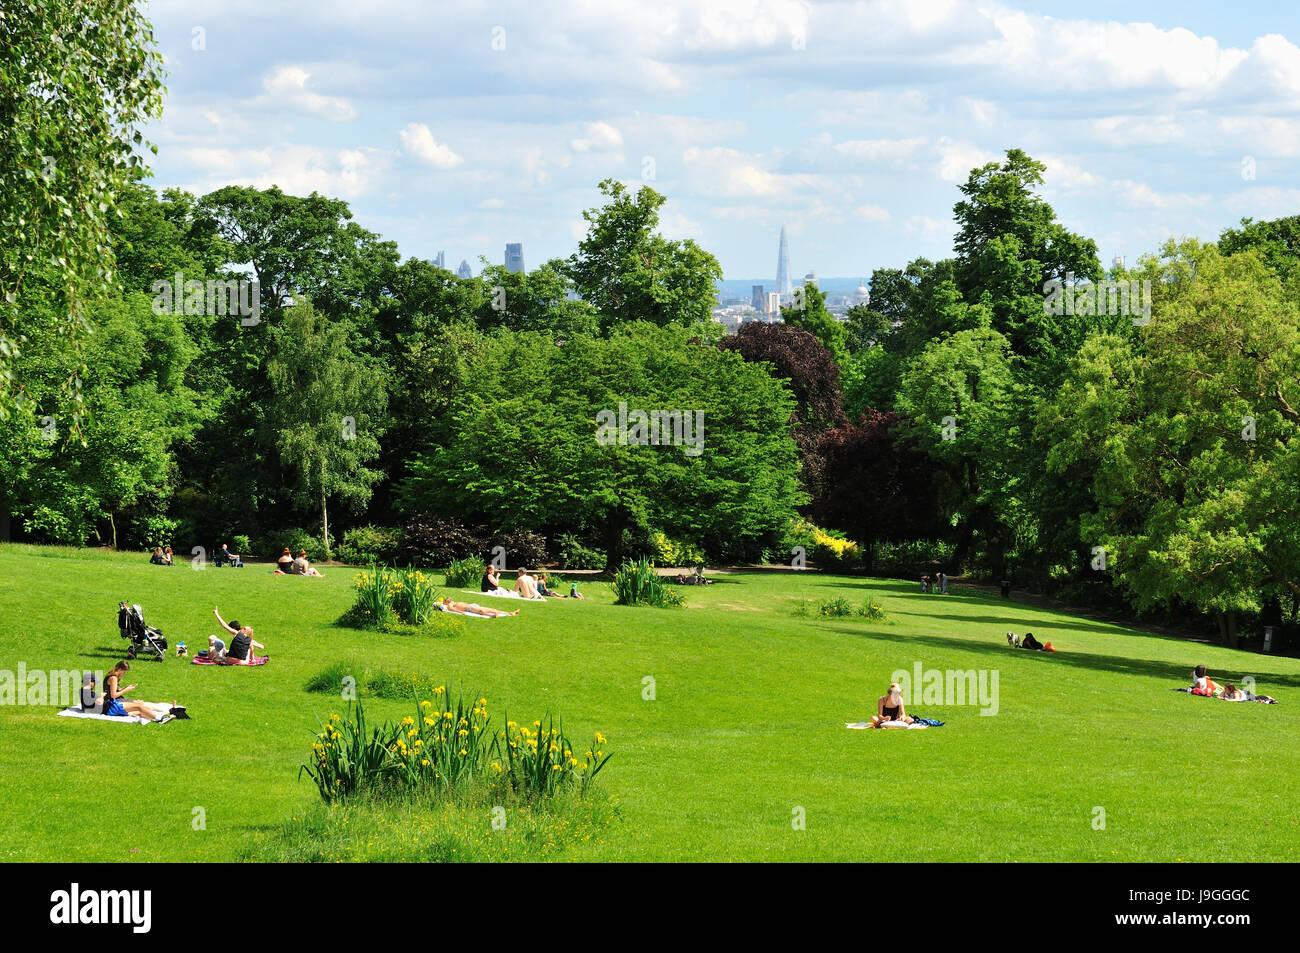 Waterlow Park, Highgate, North London UK - Stock Image